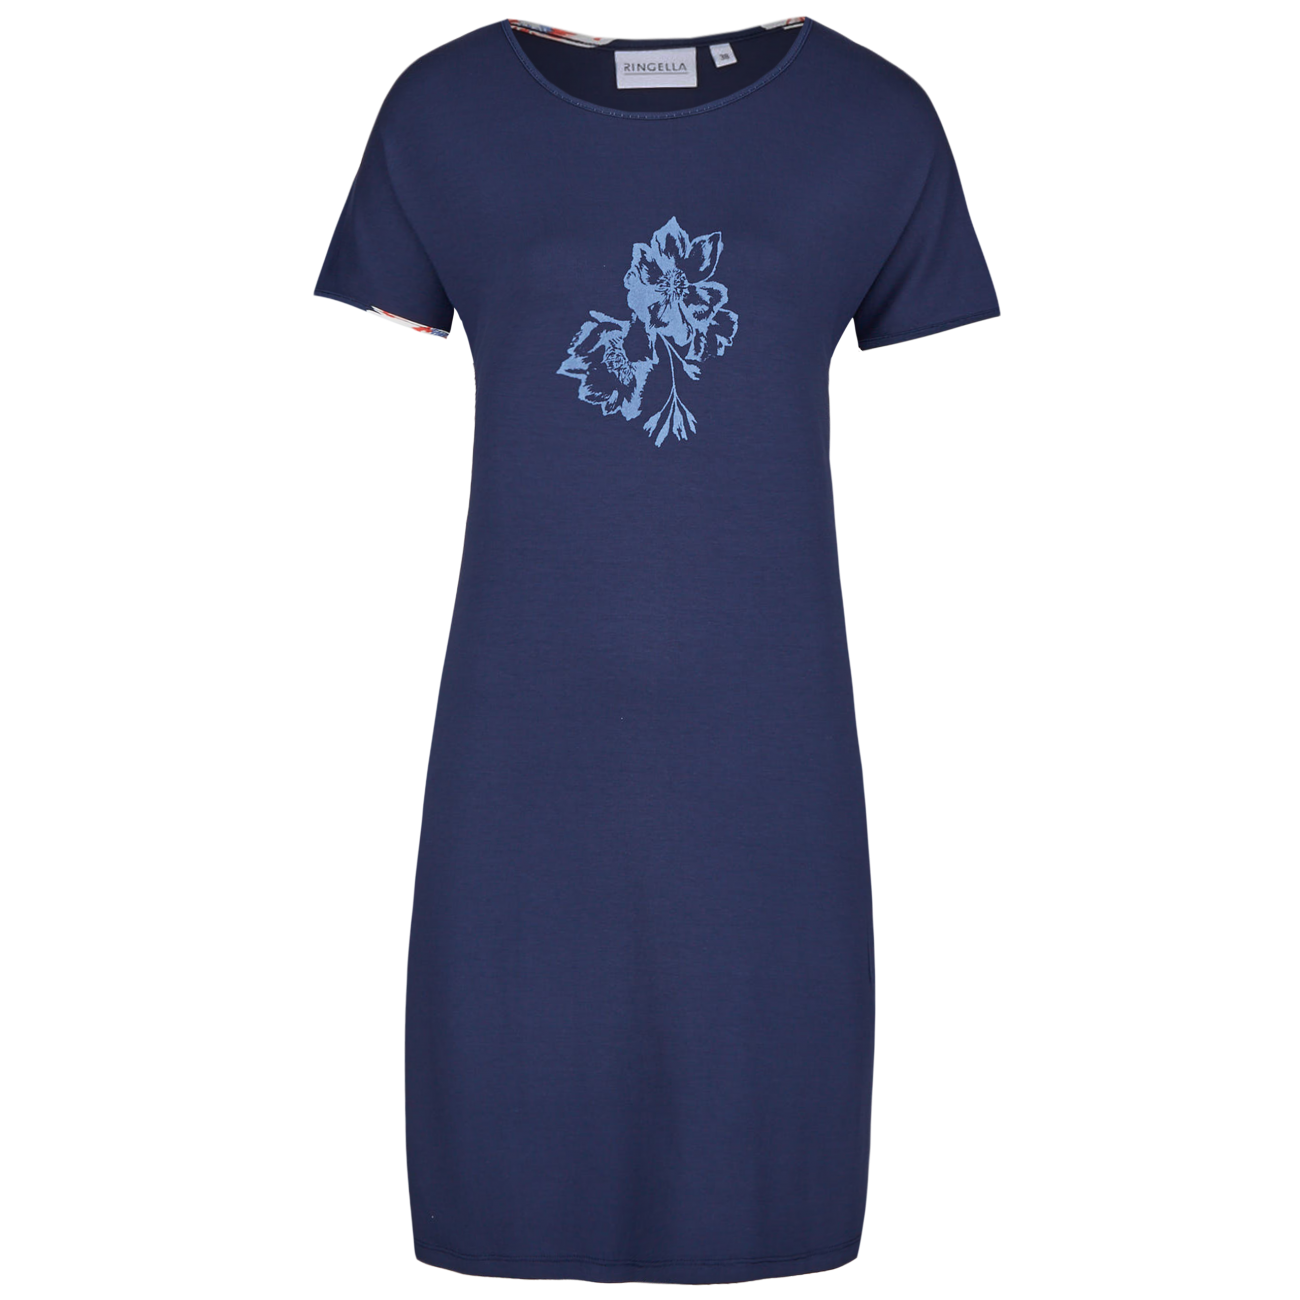 Nachthemd mit Motivdruck dark navy | 44